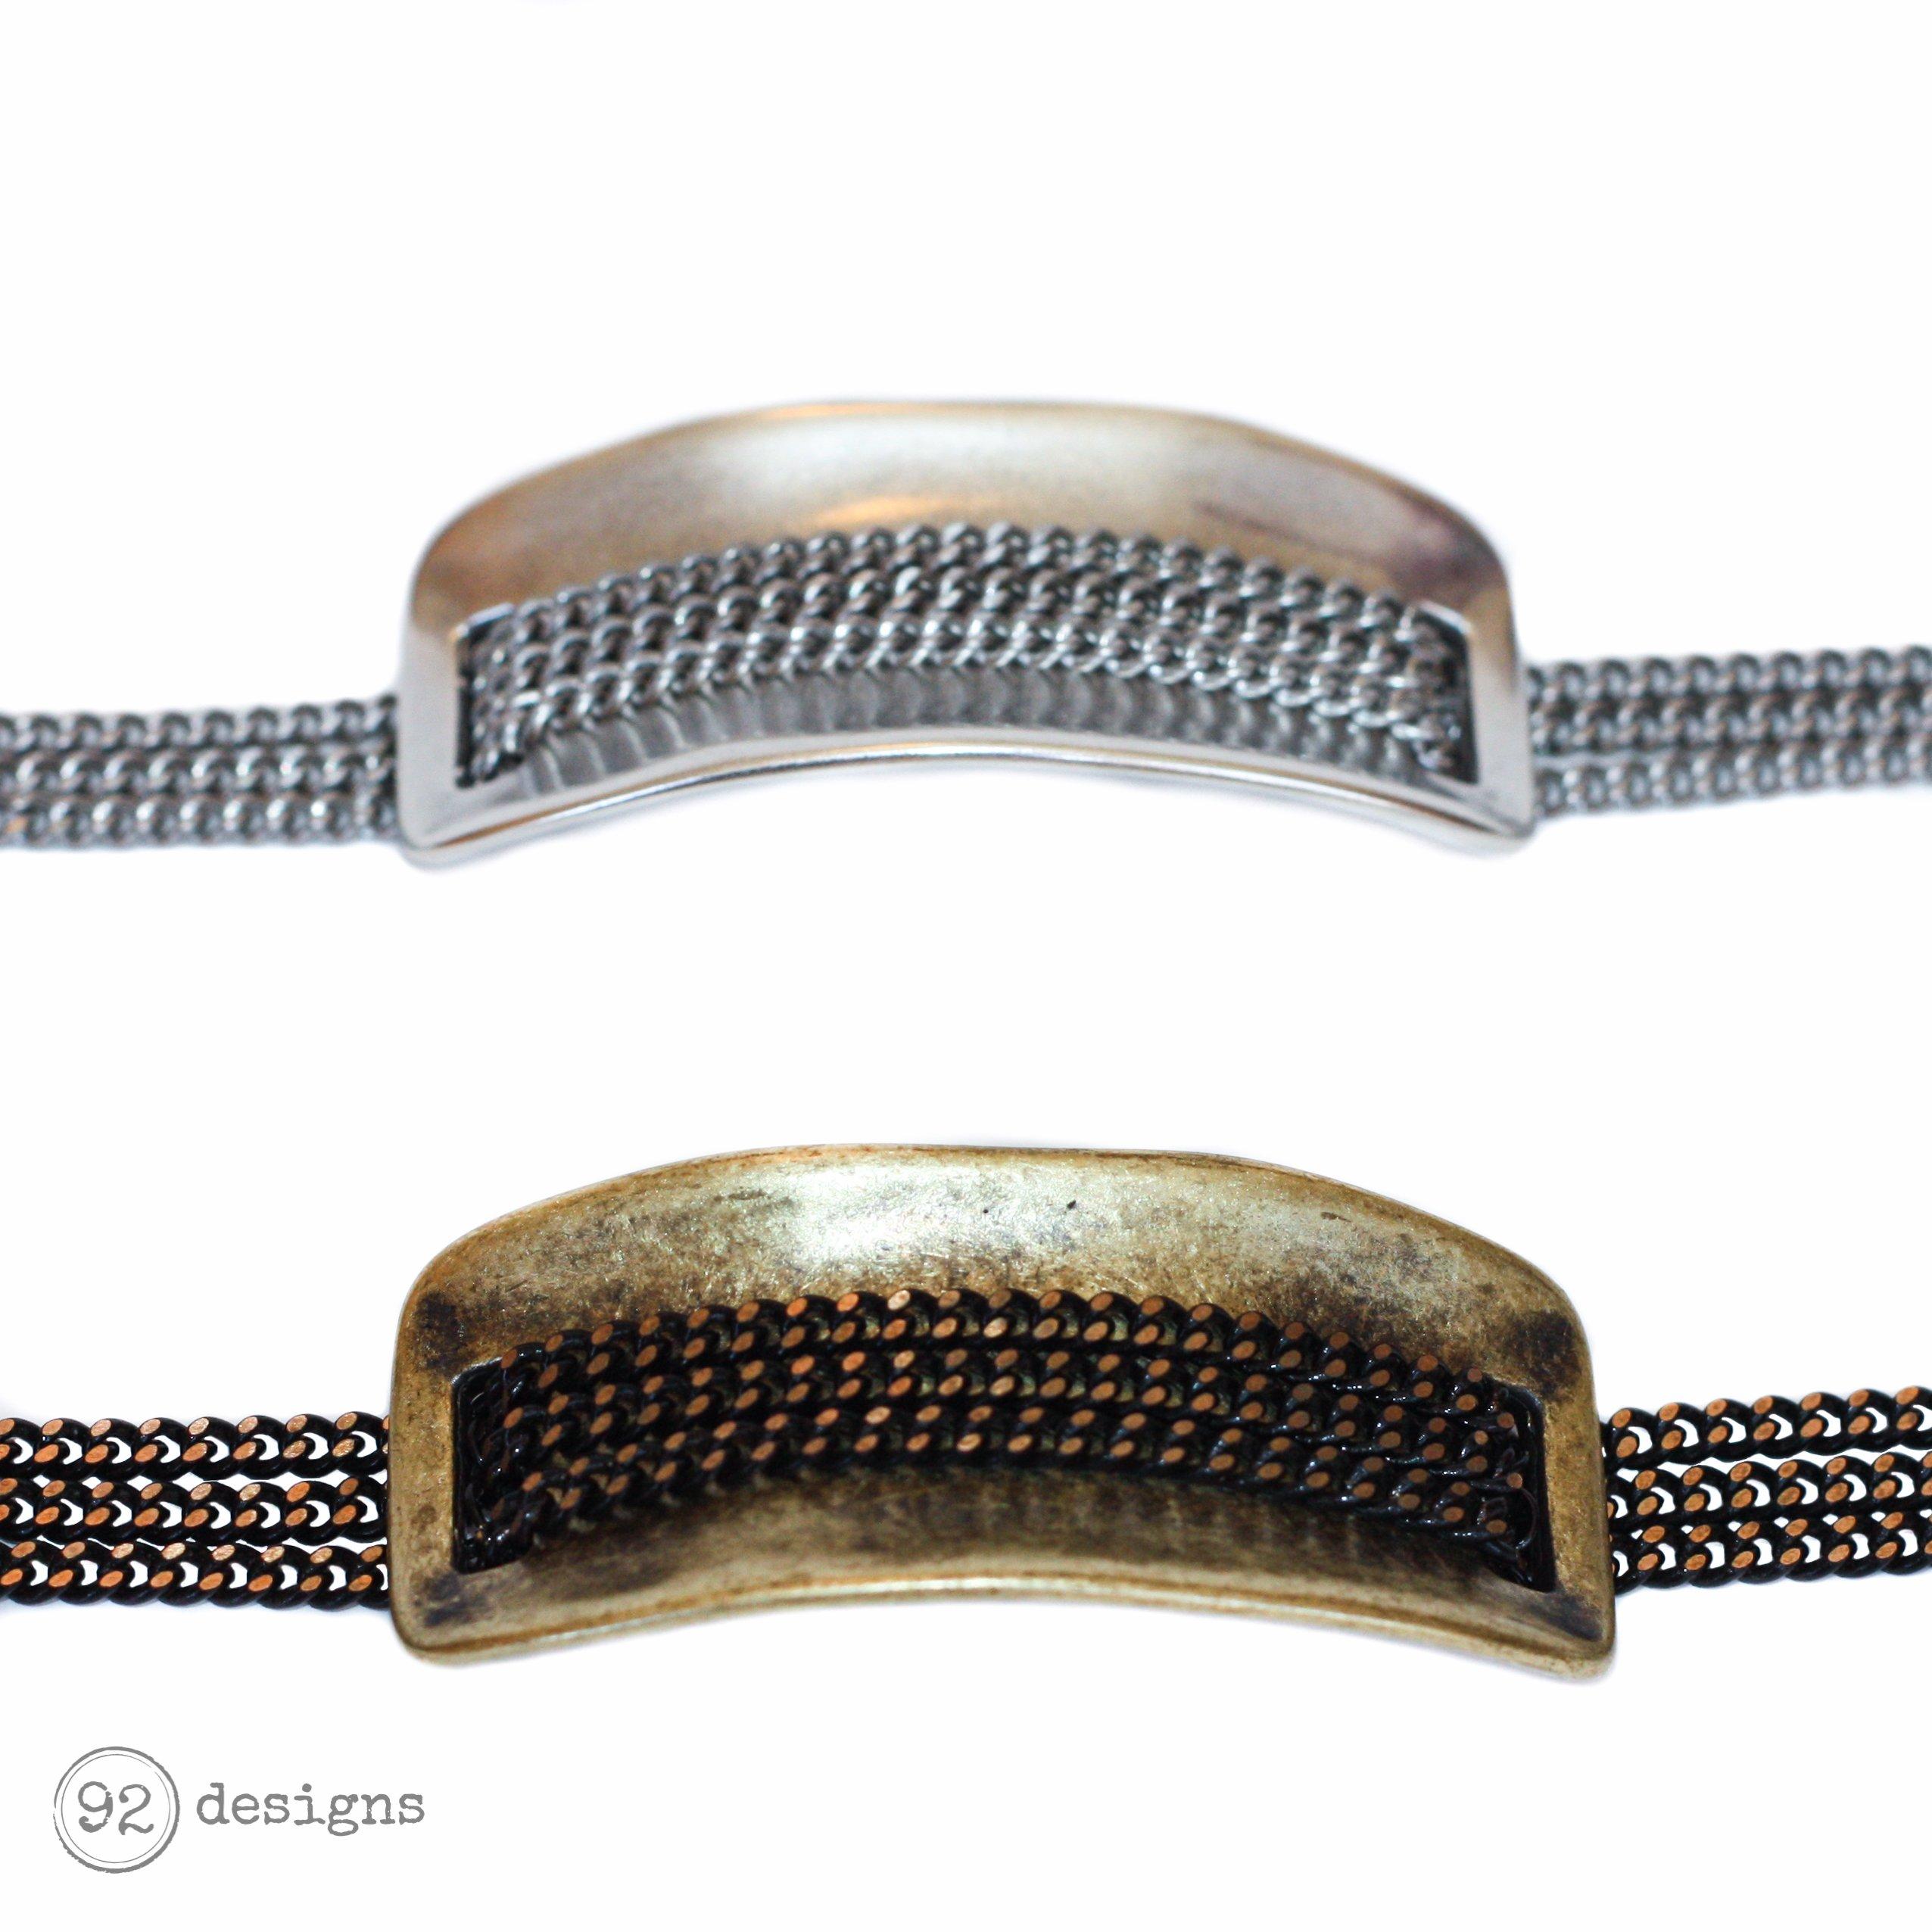 Chain Cuff Bracelets - Antique Brass and Silver - Close